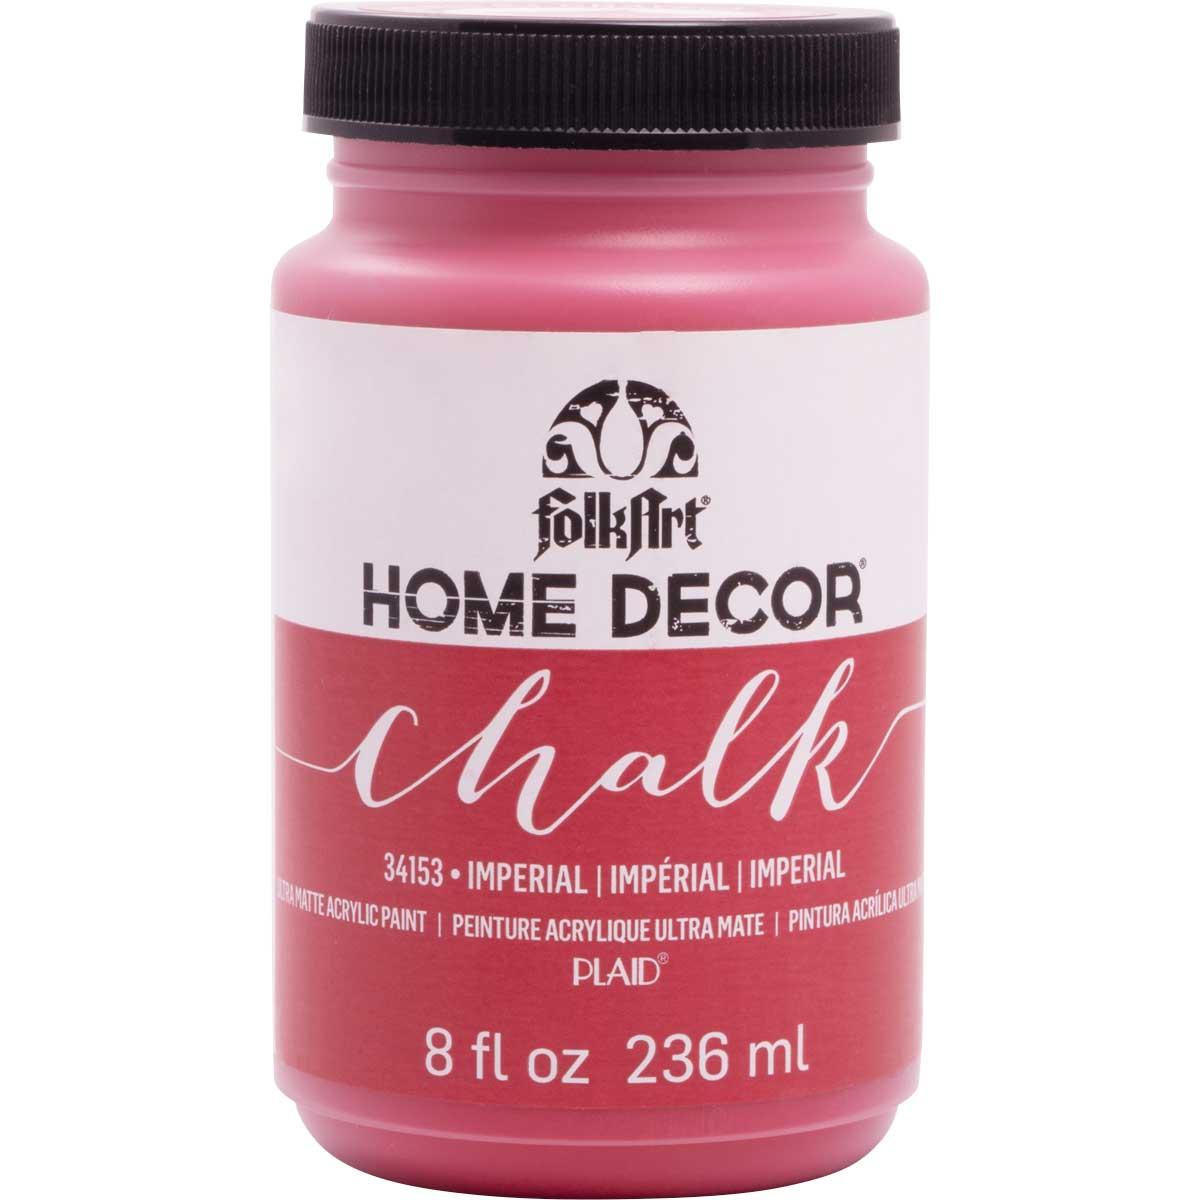 FolkArt ® Home Decor™ Chalk - Imperial, 8 oz.